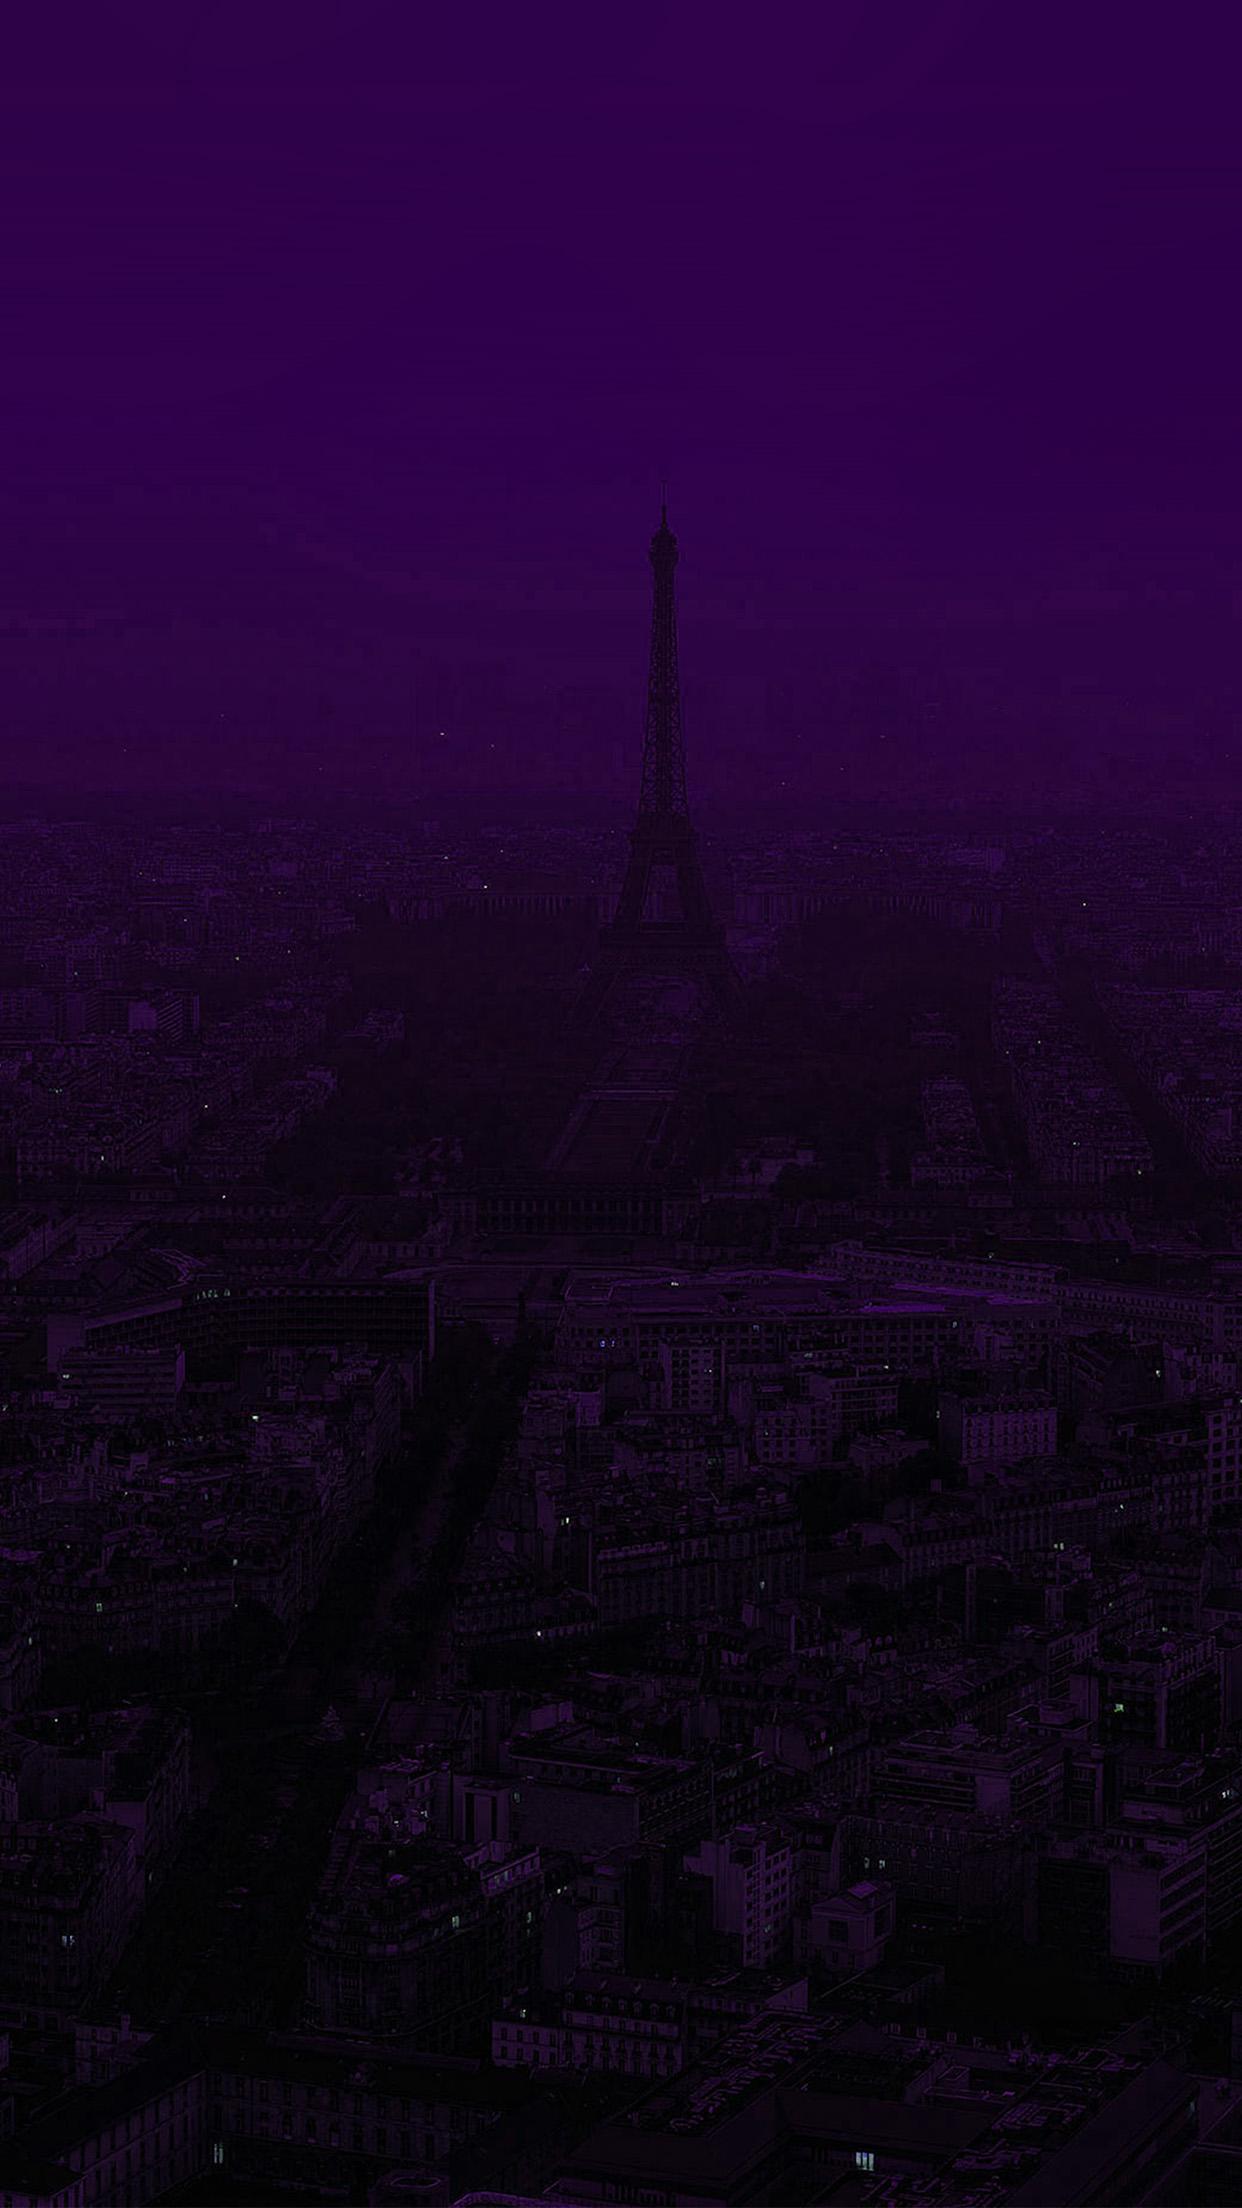 Disney Fall Phone Wallpaper Papers Co Iphone Wallpaper Bb43 Paris Dark Purple City